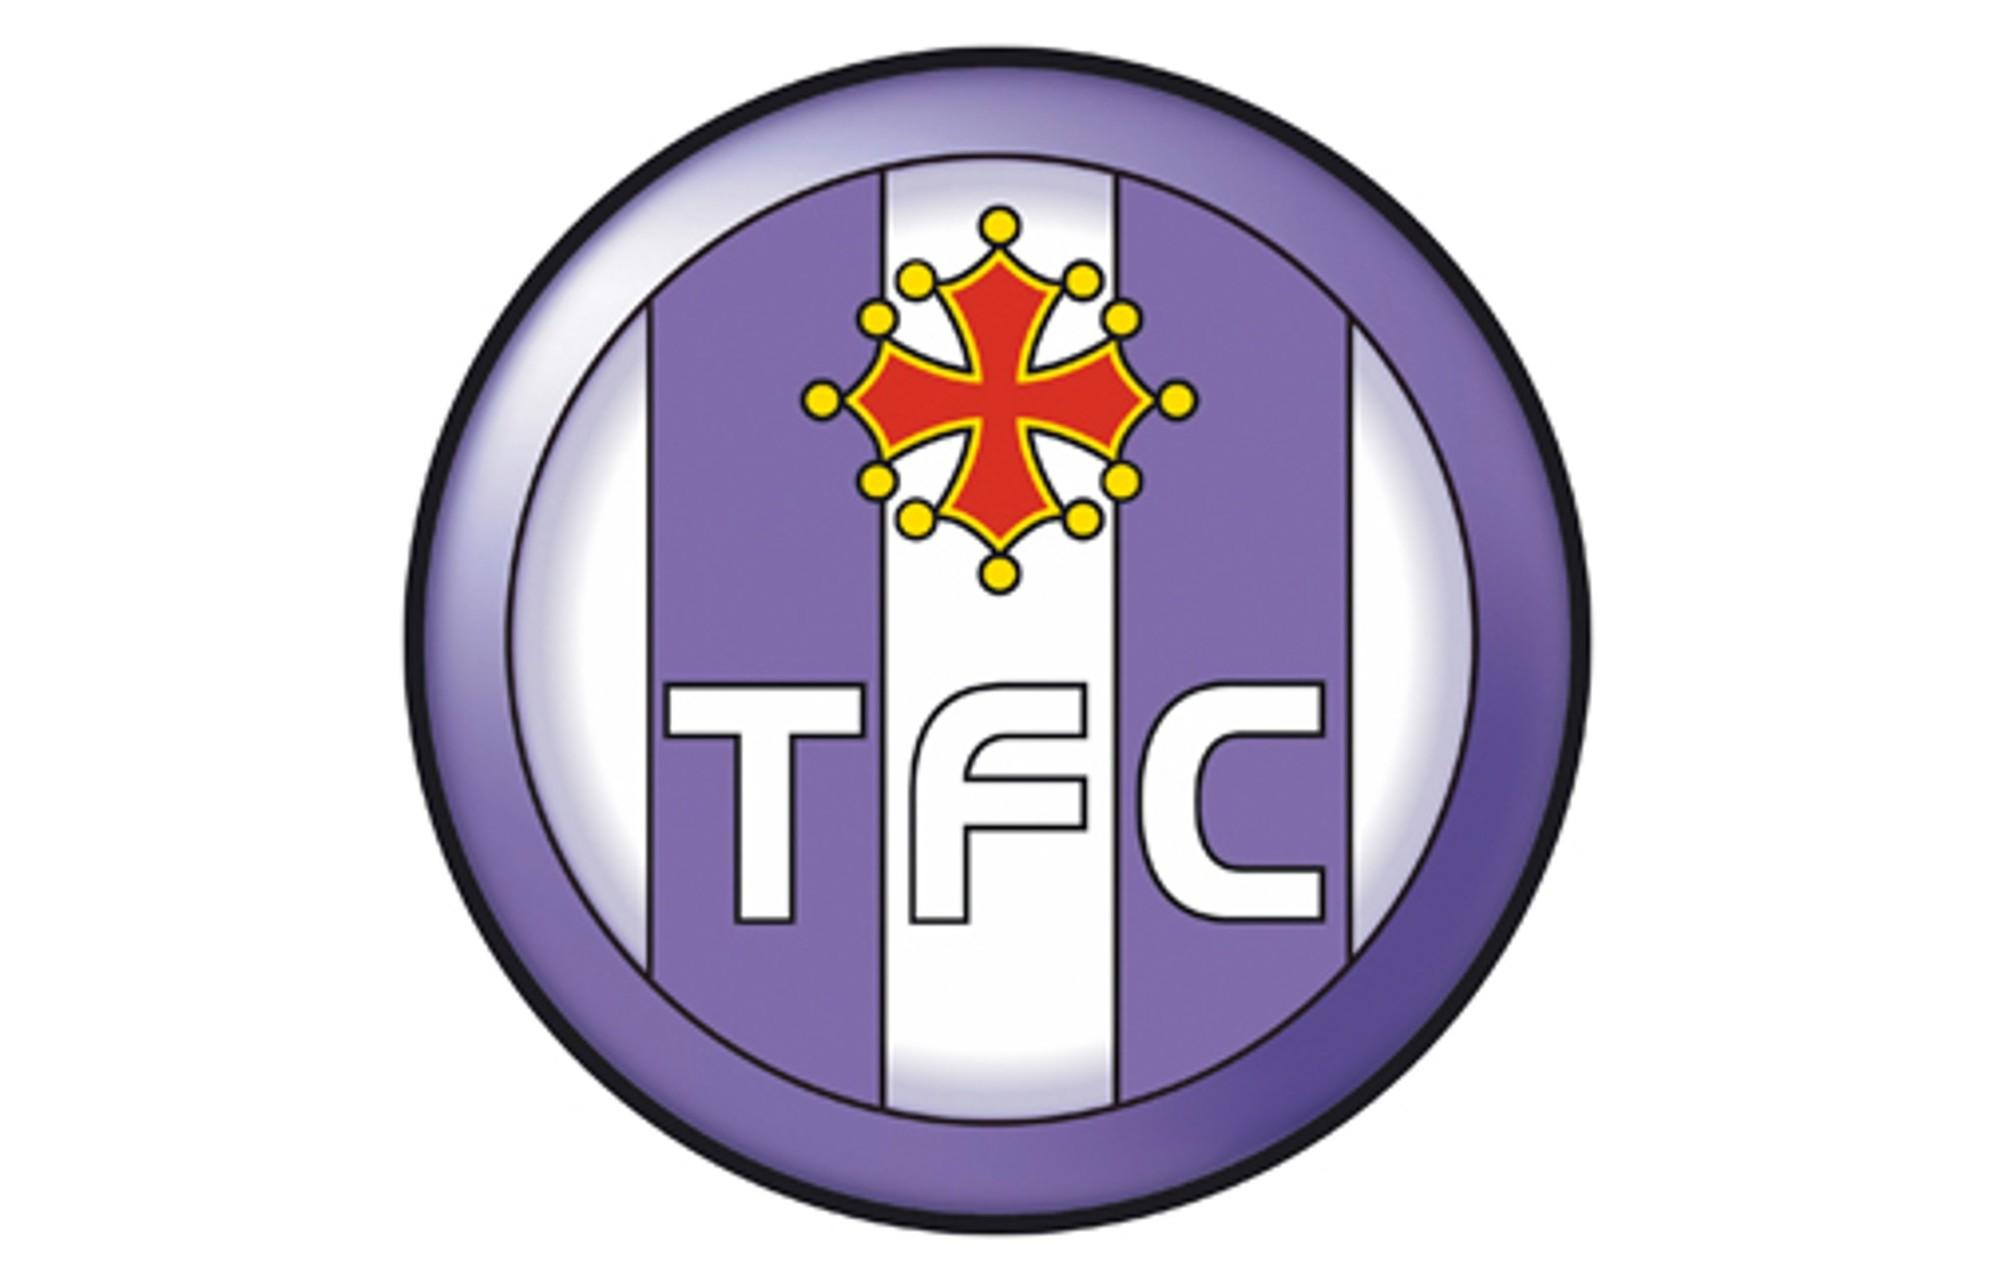 TFC - Mercato : Jean-Clair Todibo négocie avec le Barça